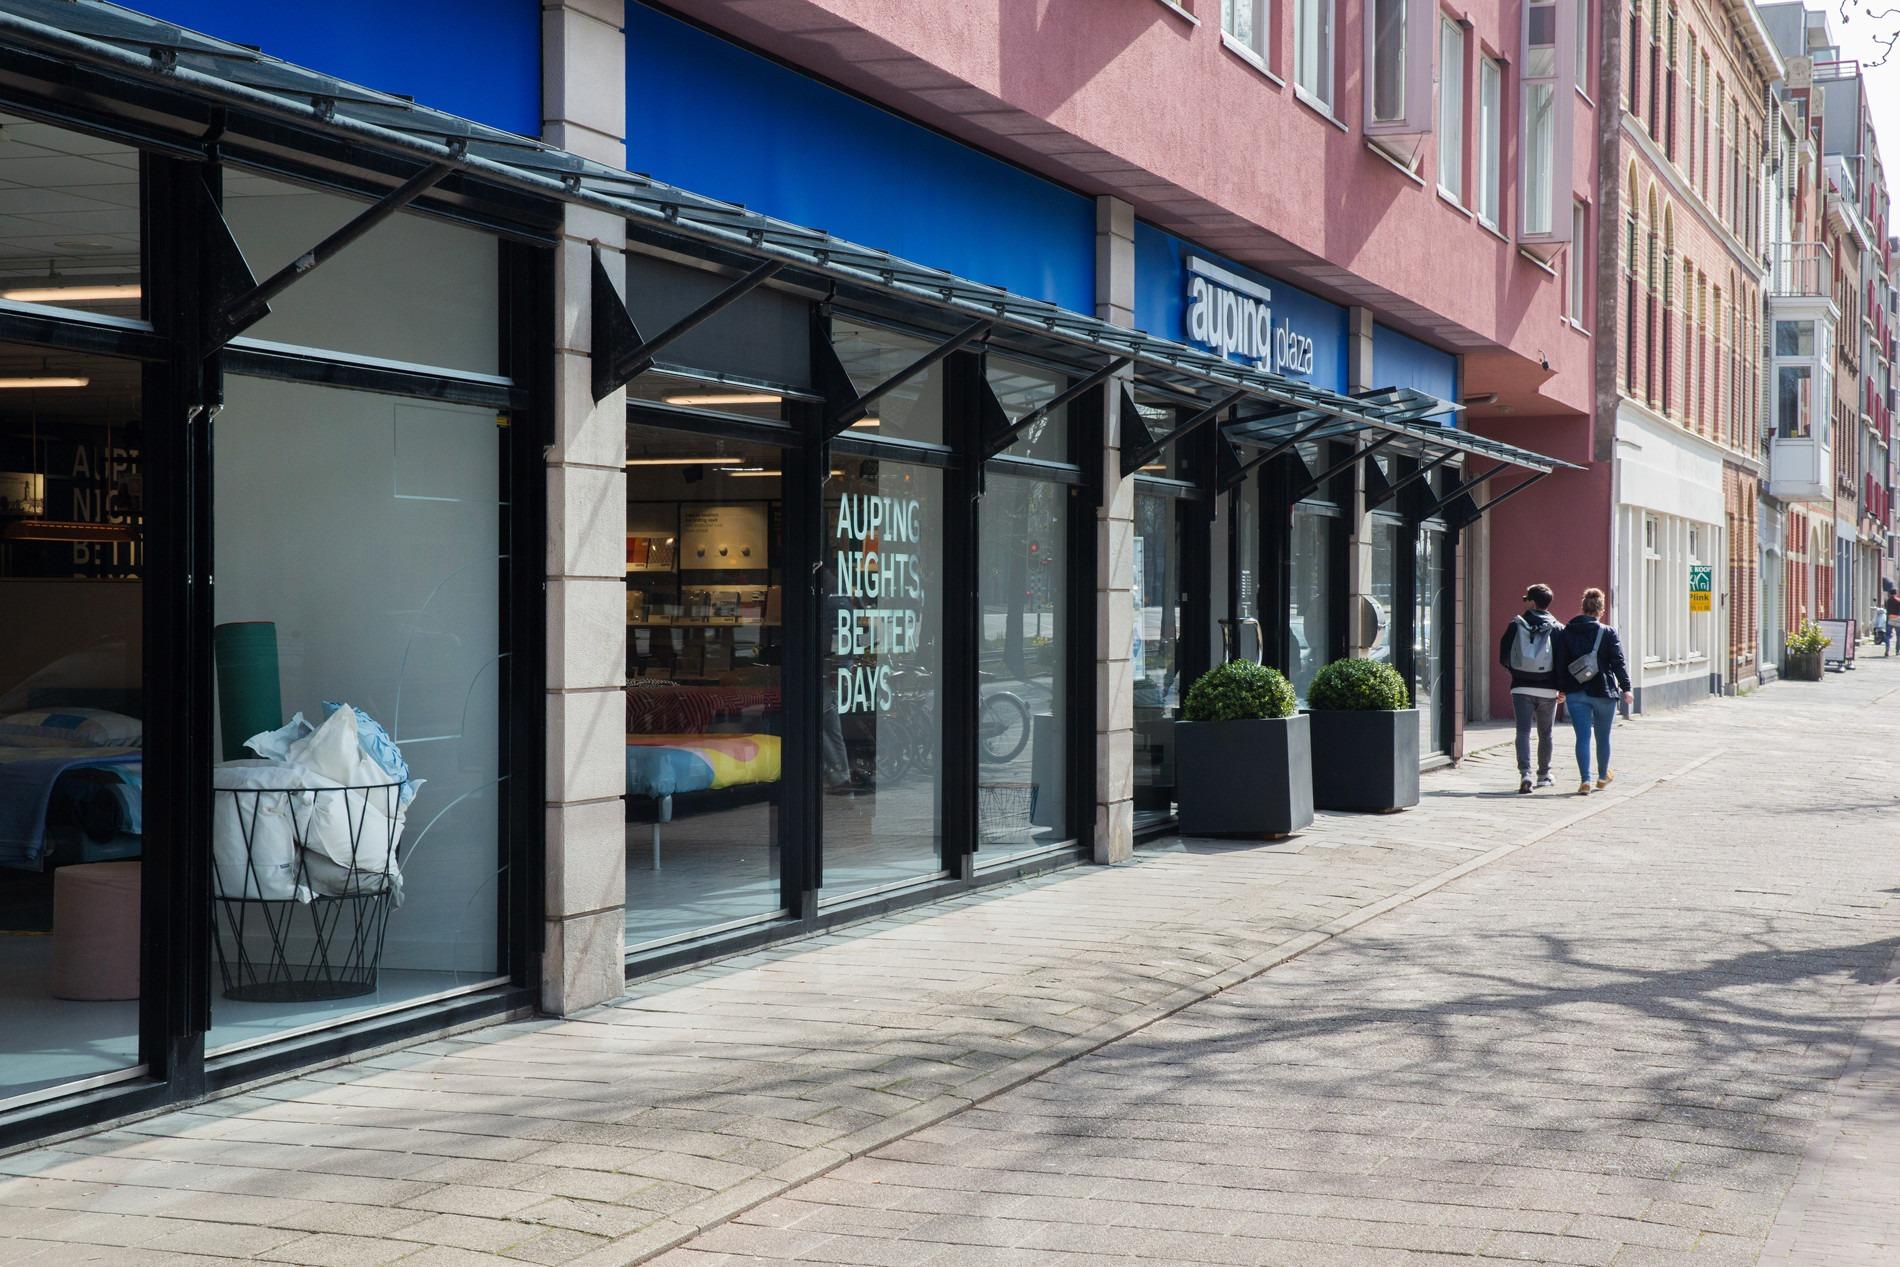 Auping beddenwinkel Den Haag